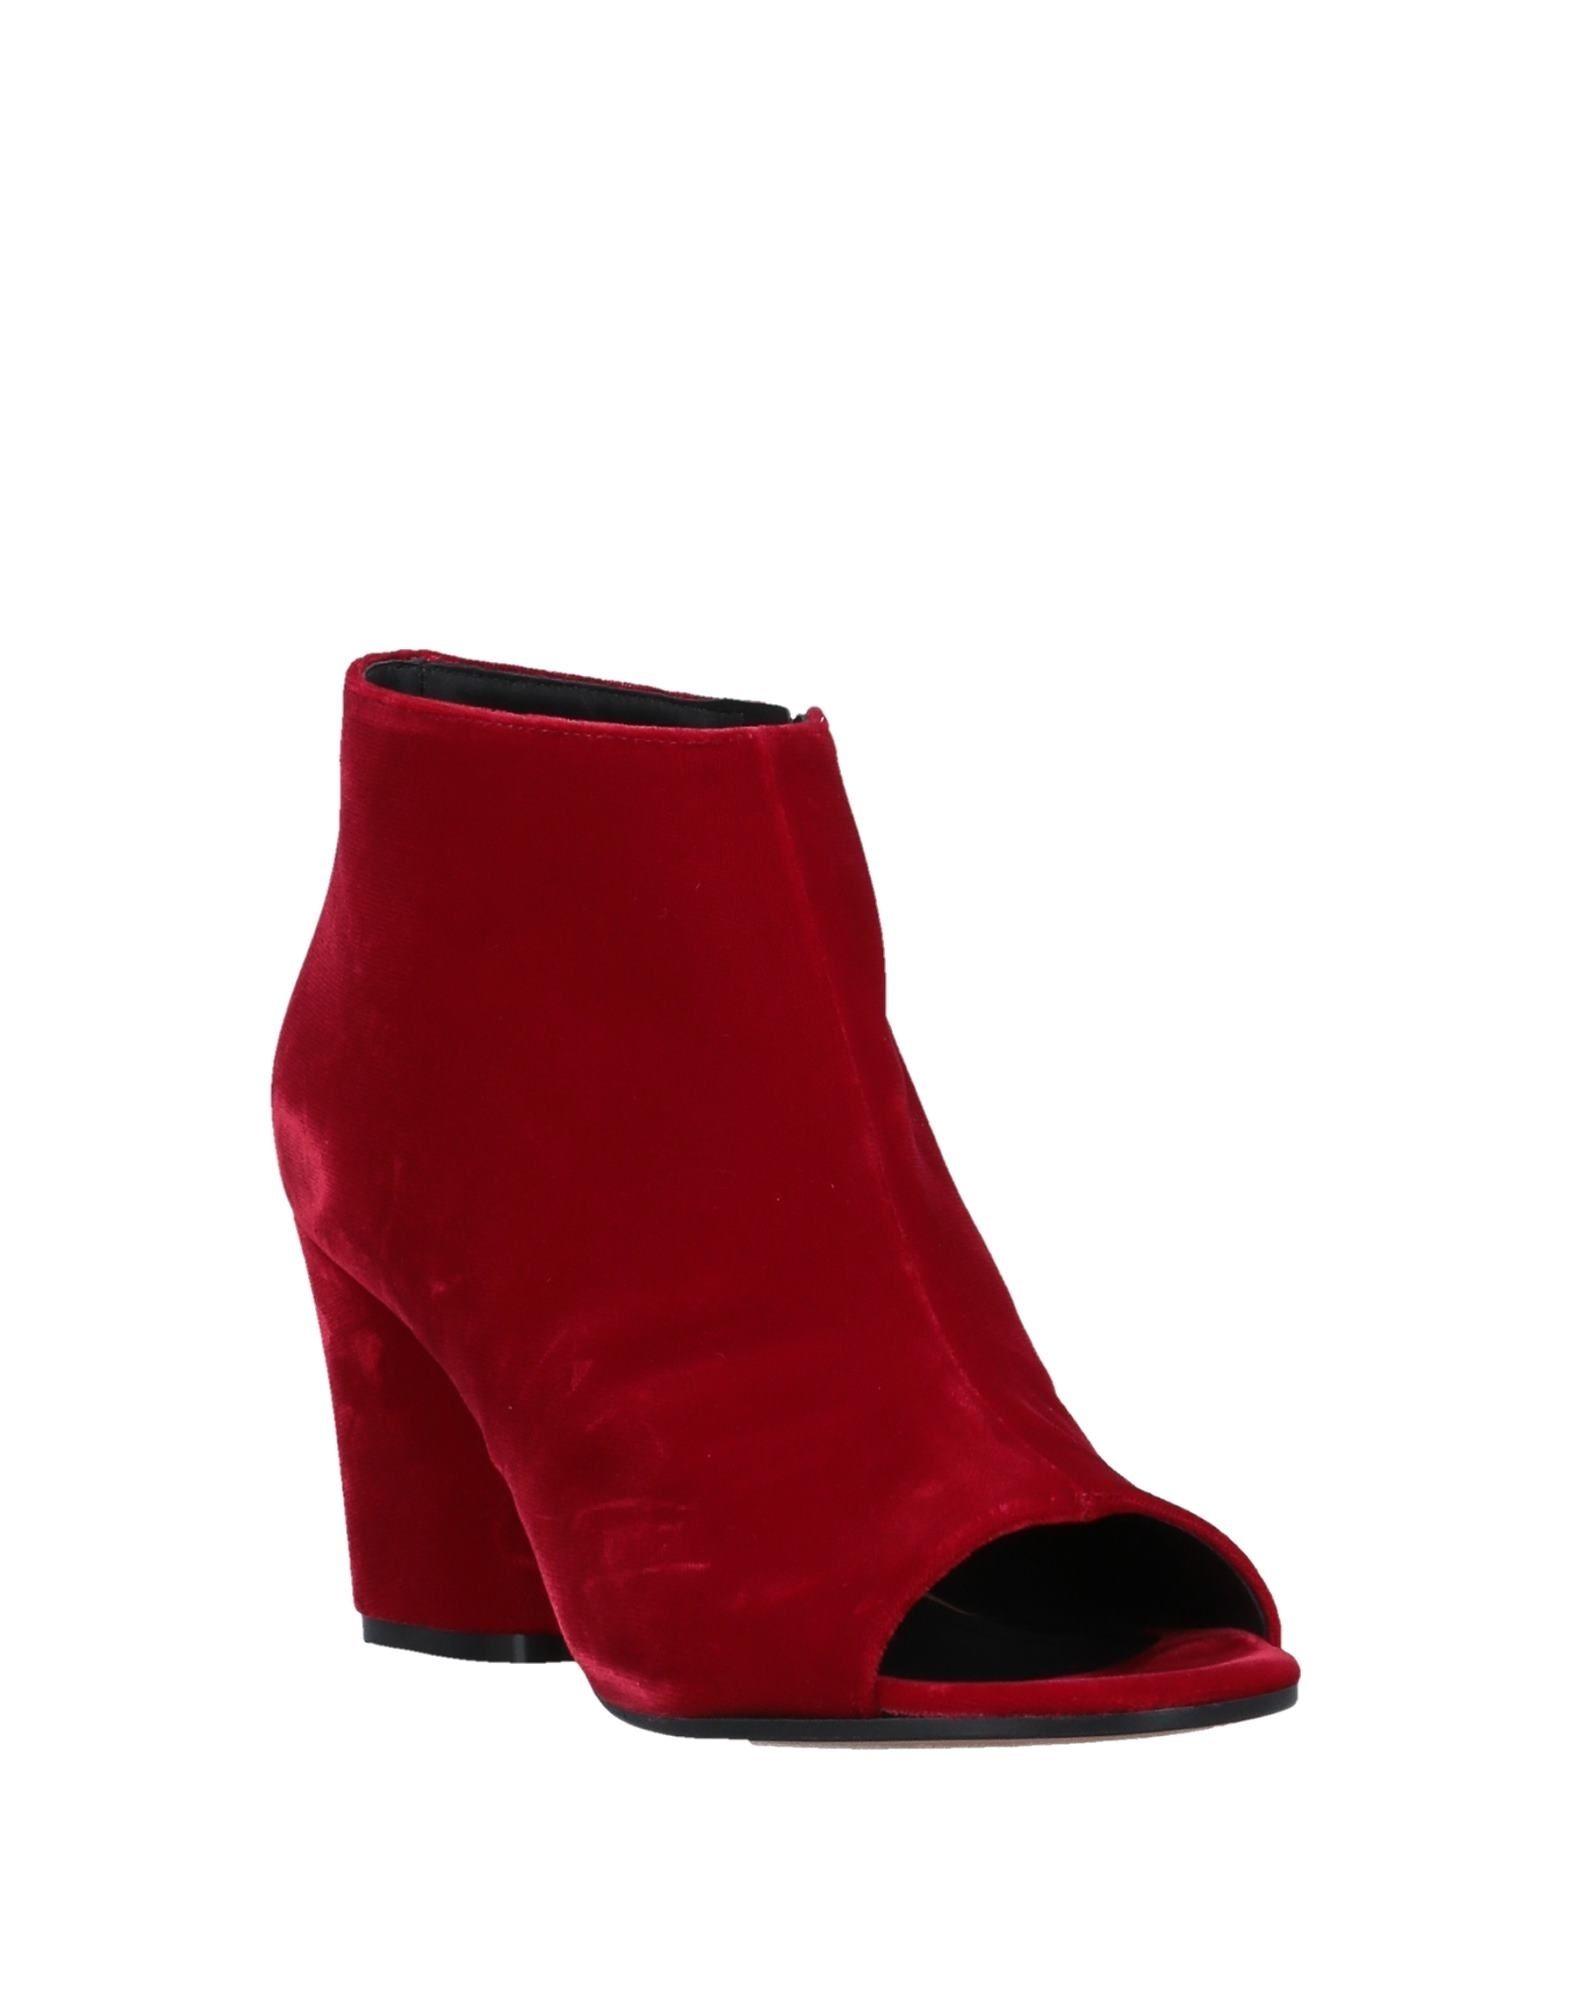 Rabatt Schuhe 11536920MH Maison Margiela Stiefelette Damen 11536920MH Schuhe 691ad5